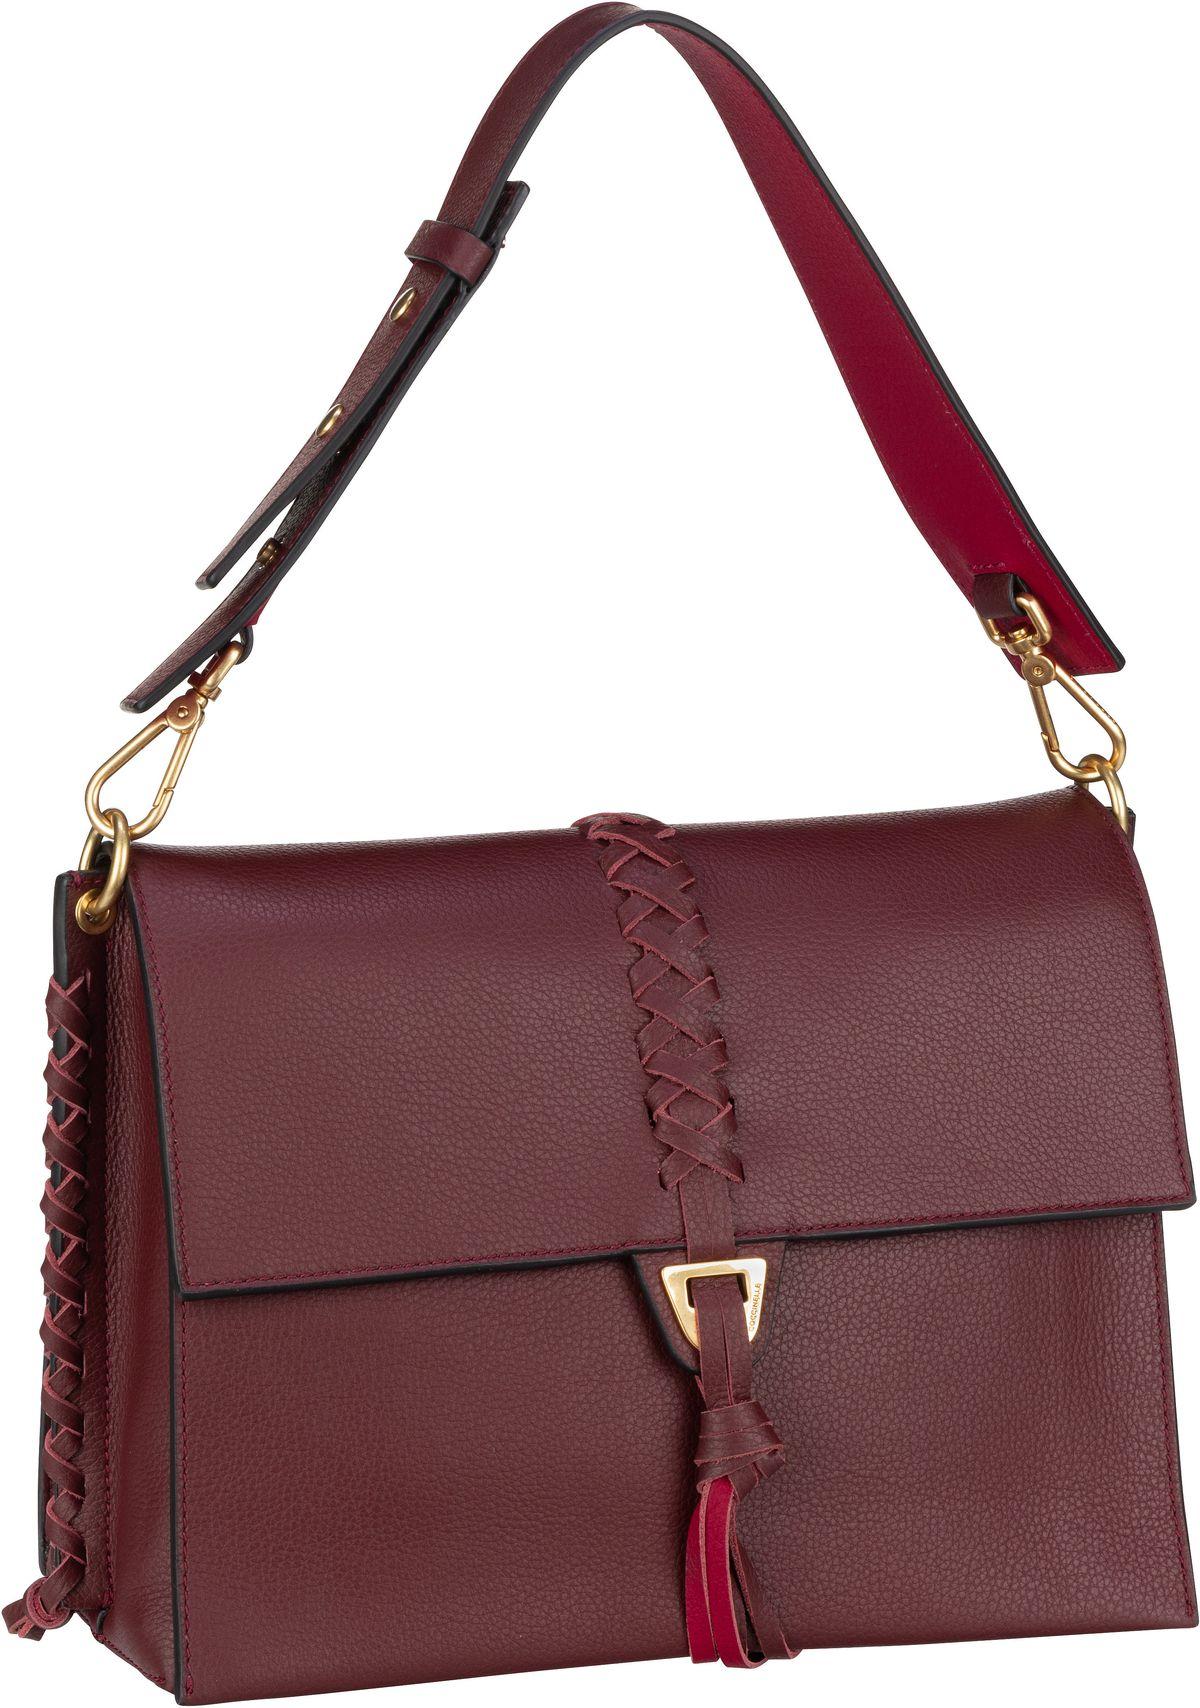 Handtasche Louise Infilatura 1201 Marsala/Cherry